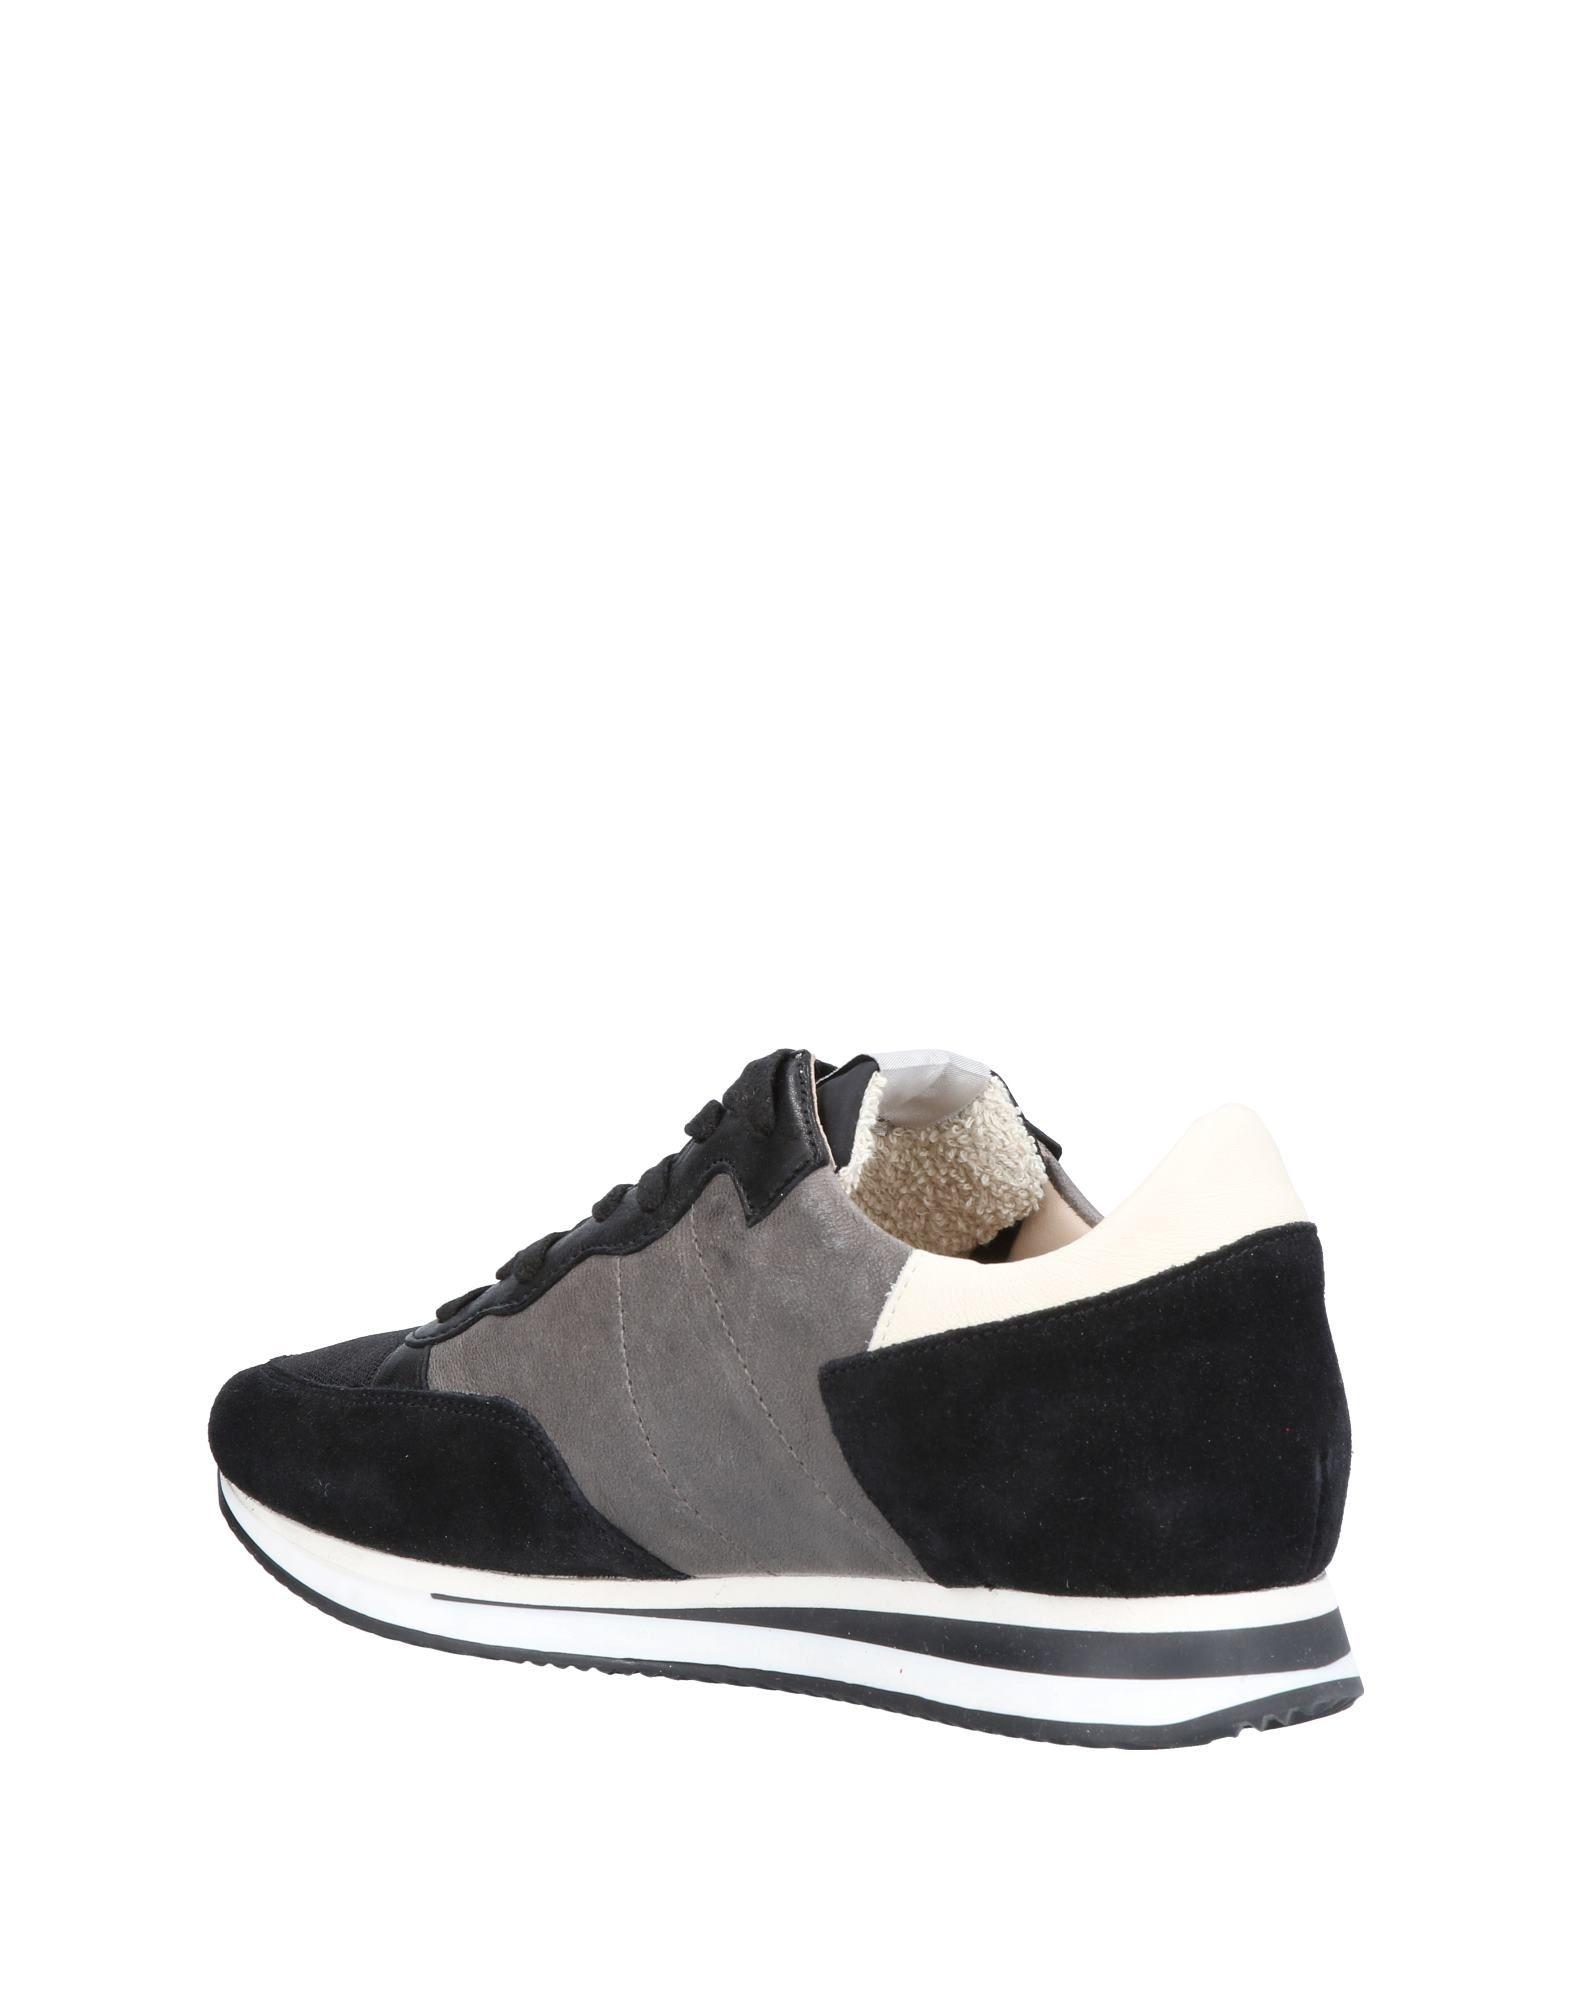 Rabatt echte Schuhe 11468034HE Quattrobarradodici Sneakers Herren  11468034HE Schuhe 2e608d